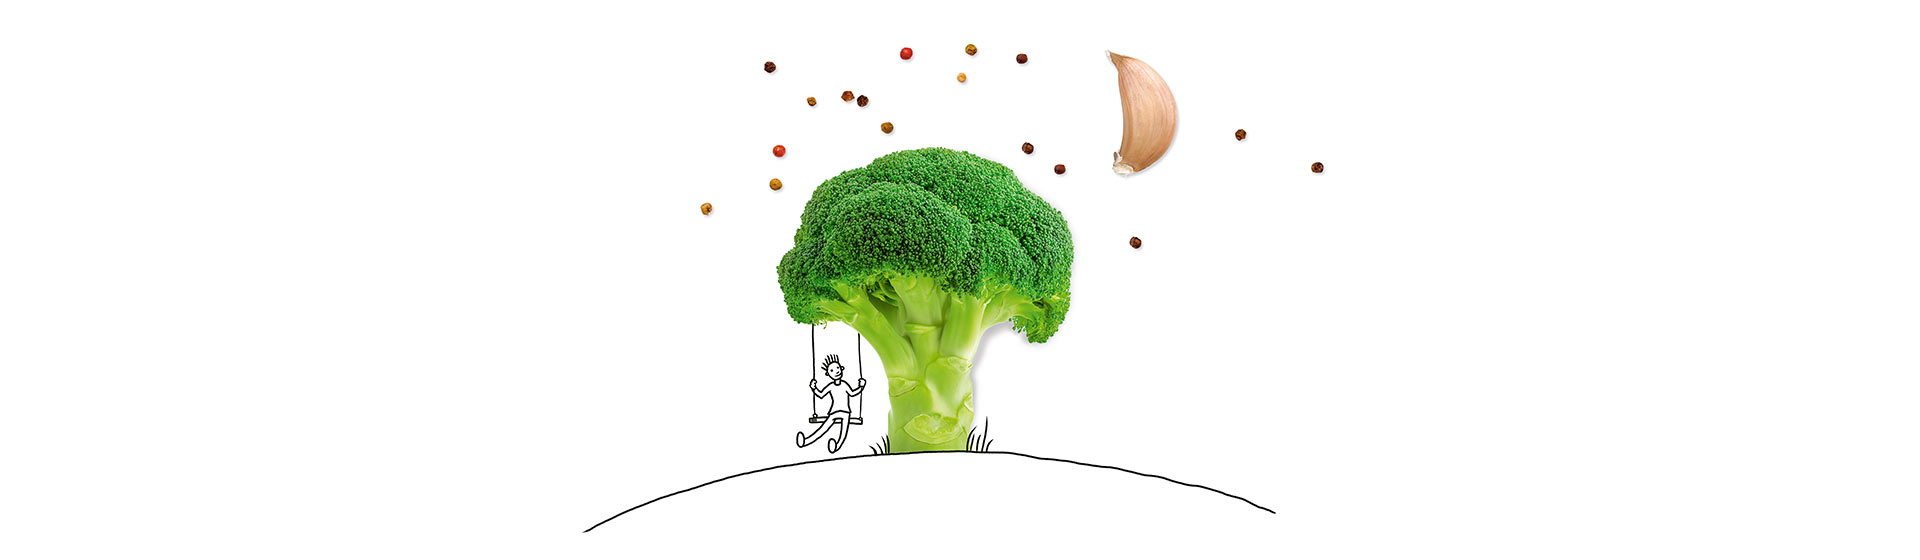 Broccolibaum